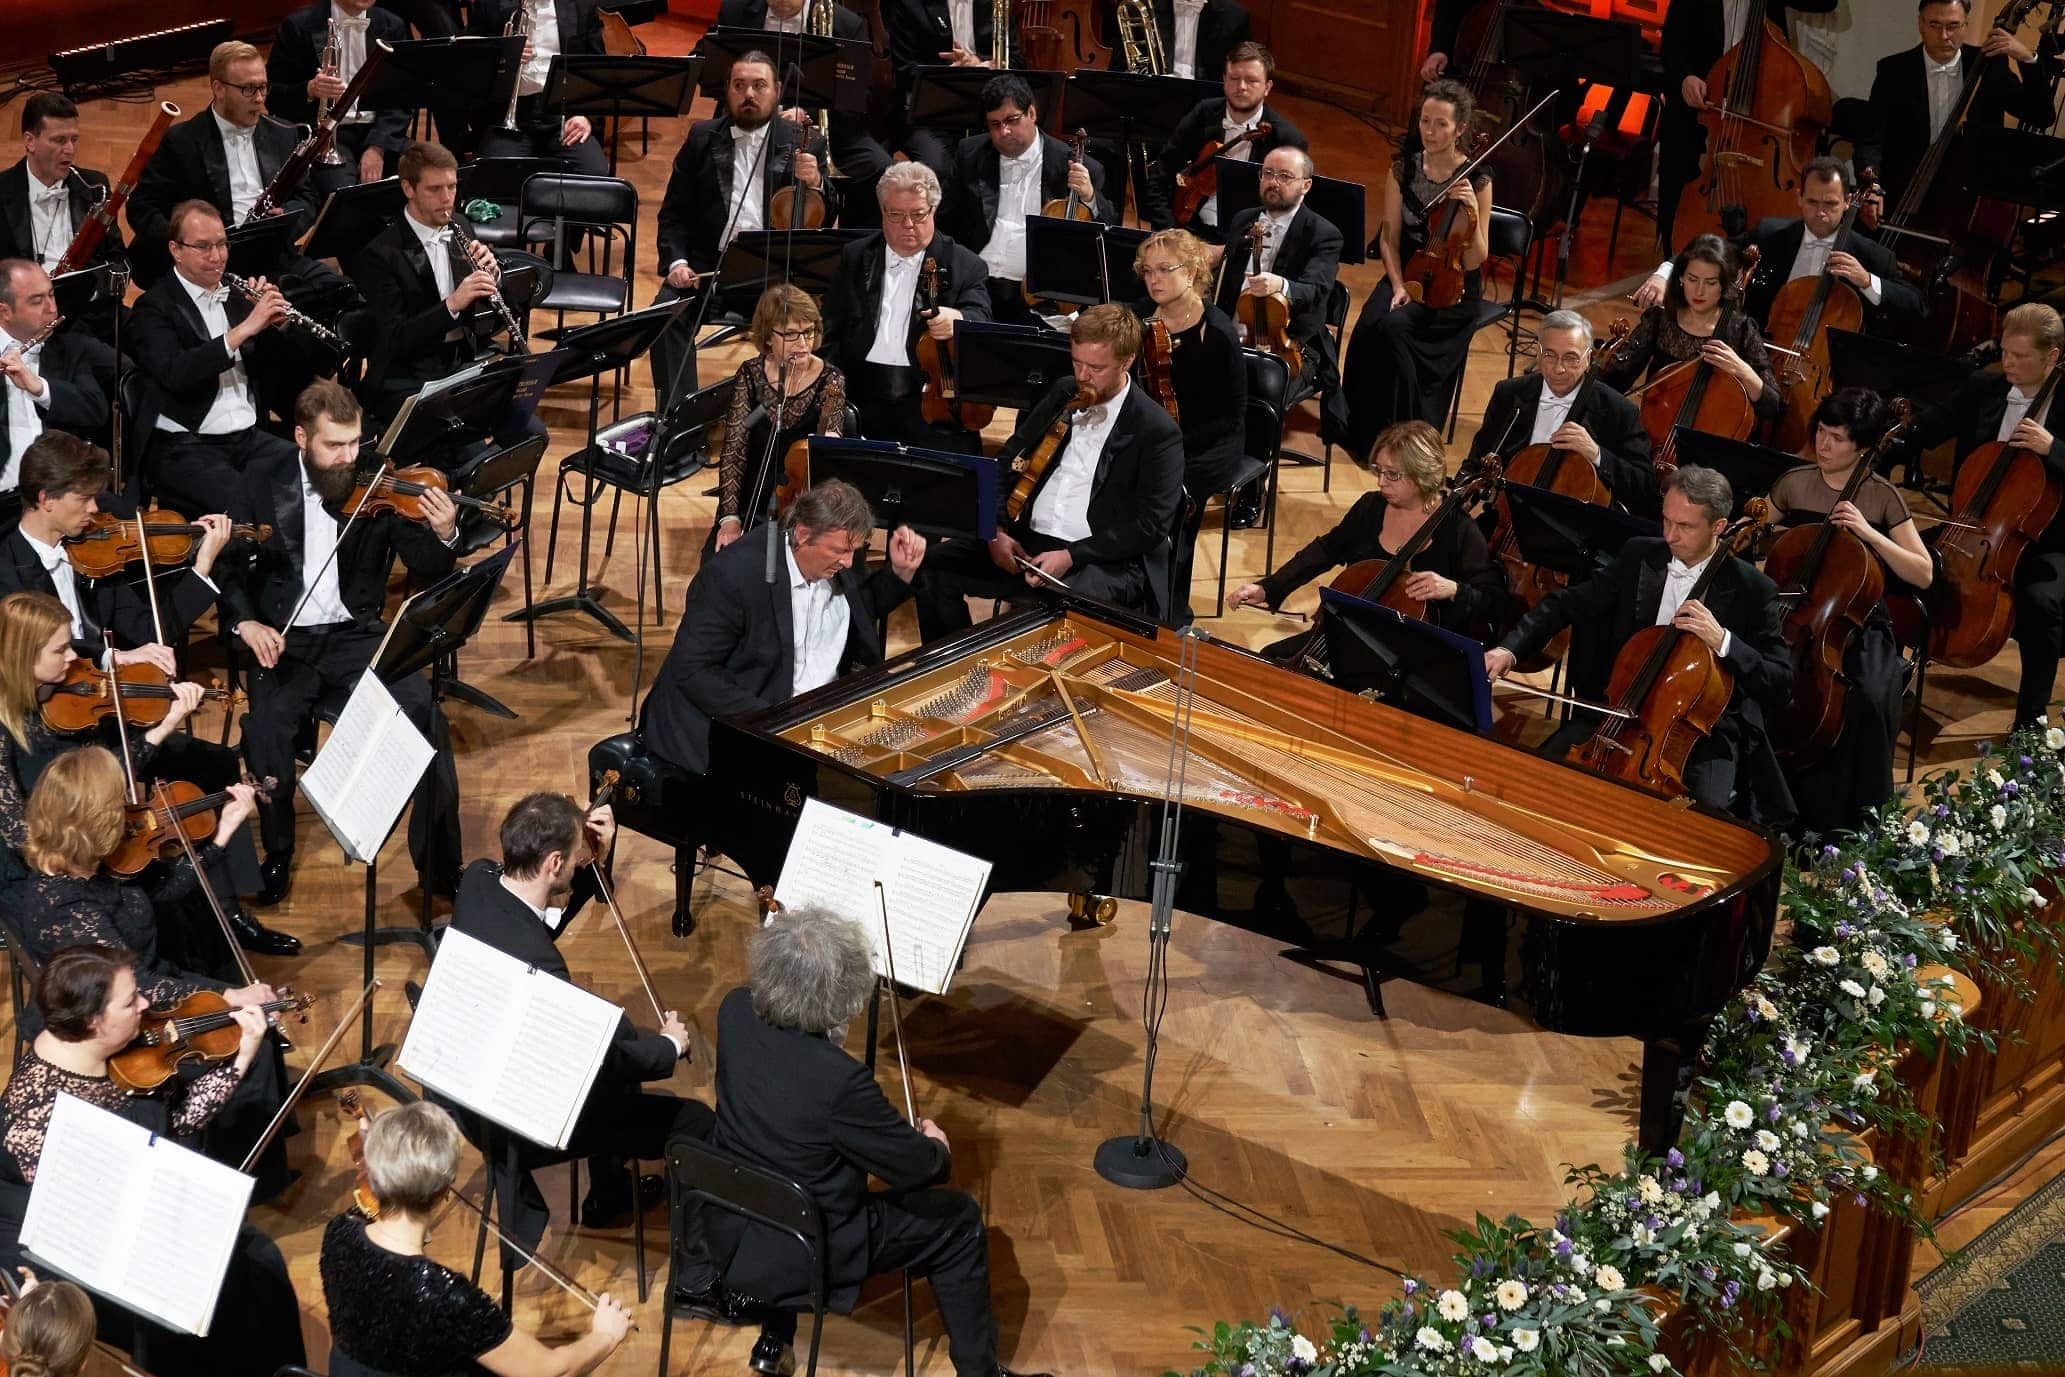 Борис Березовский и Госоркестр исполнили Концерт № 1 П. Чайковского без дирижёра